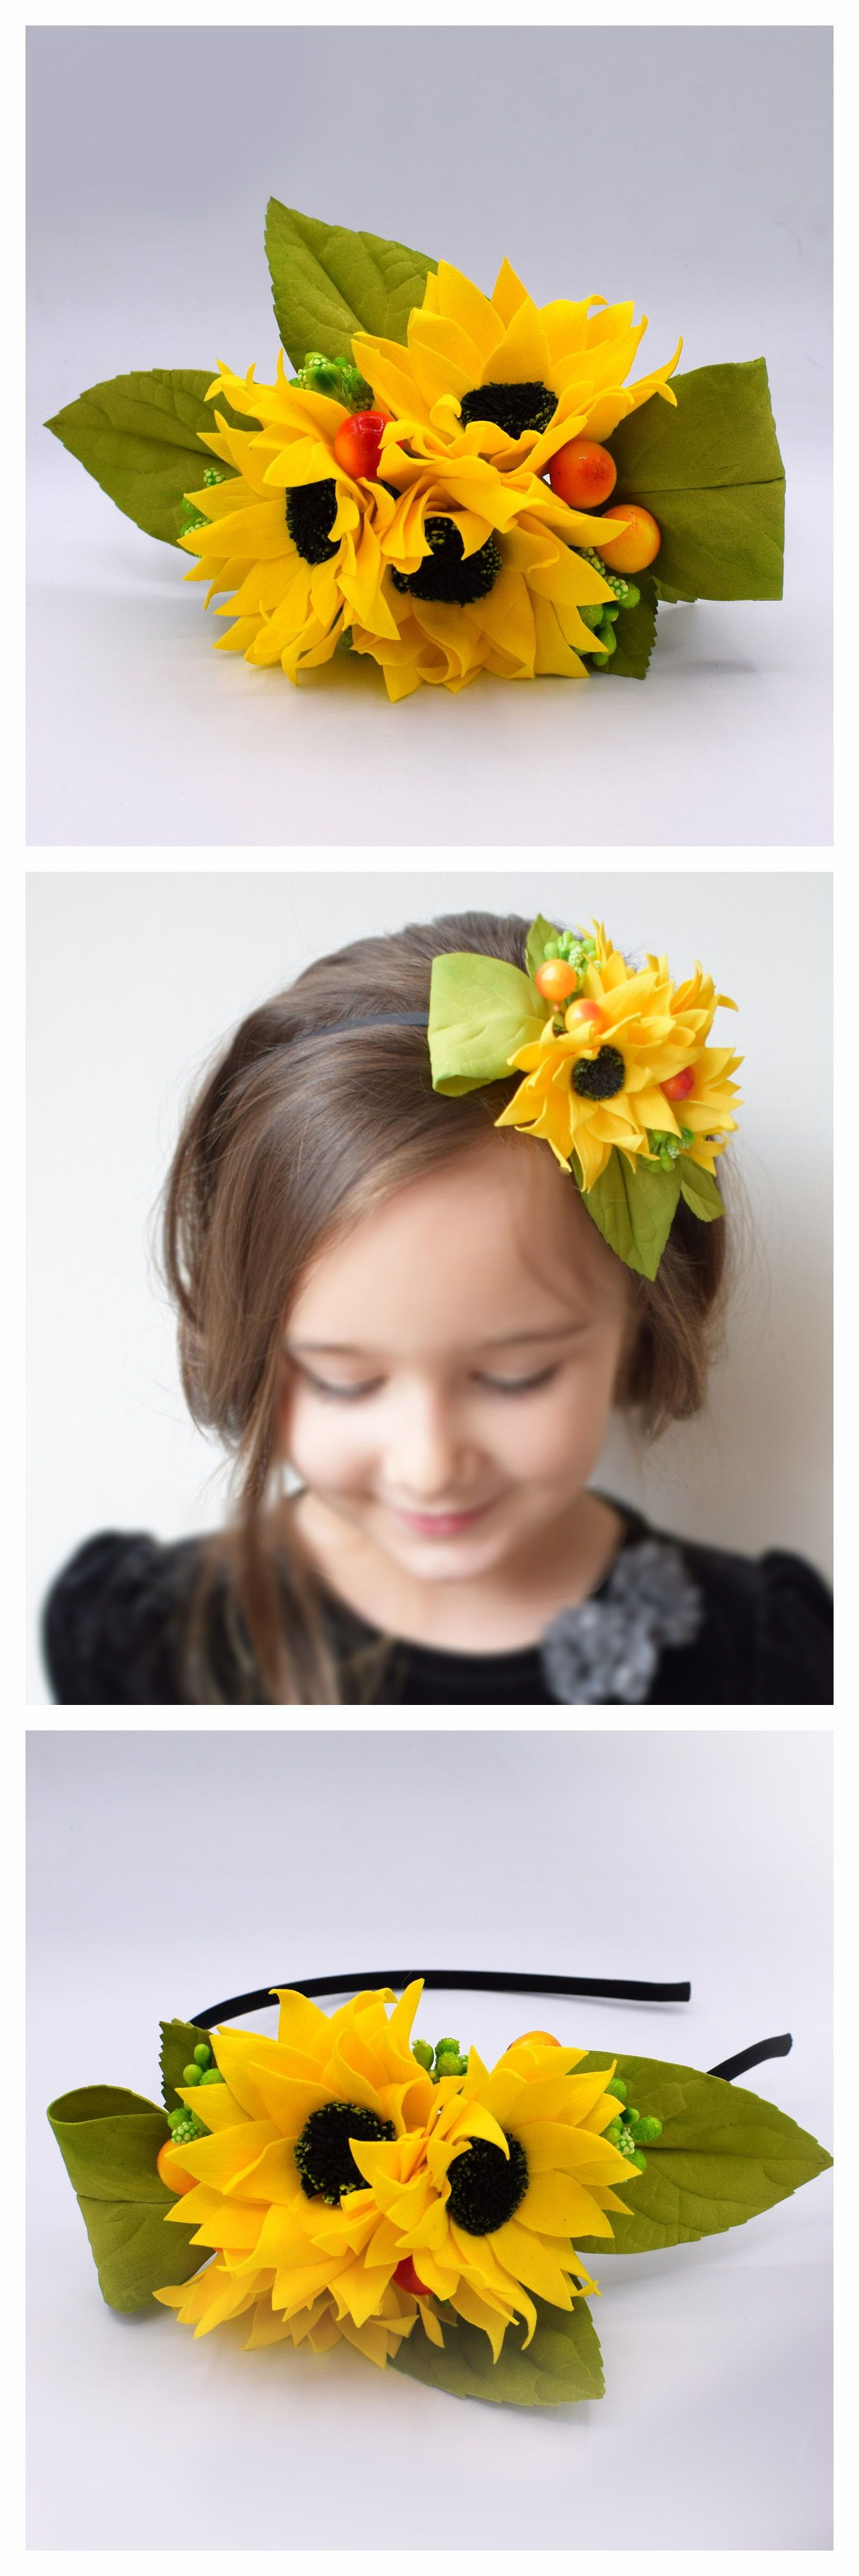 Sunflower Headband Yellow Flower Crown Summer Festival Etsy Flower Hair Accessories Yellow Flower Crown Flower Girl Headbands